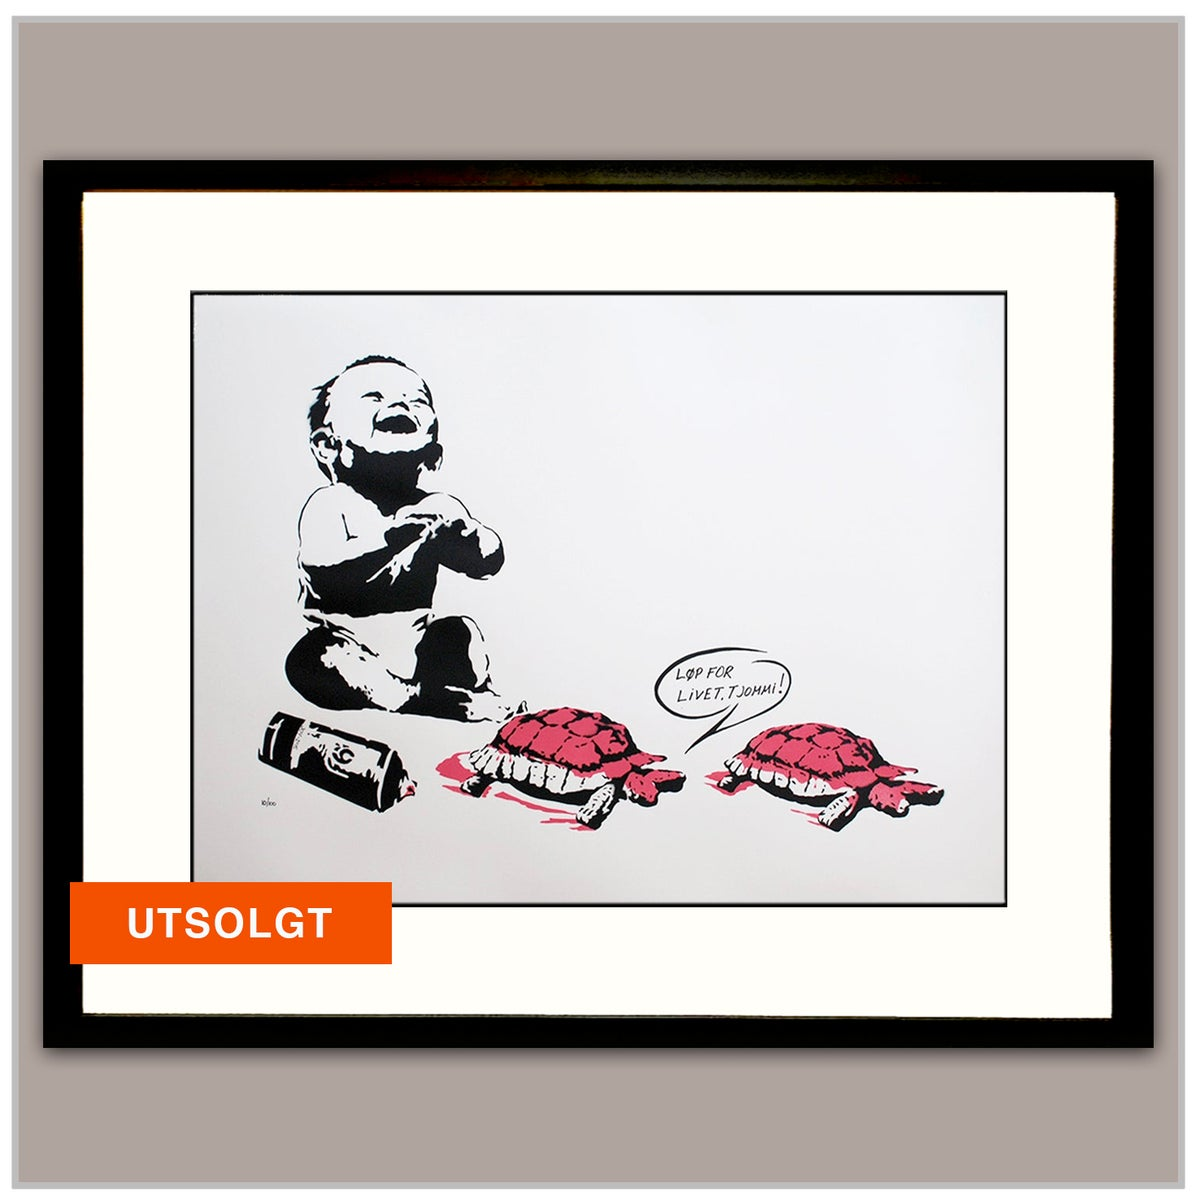 Image of LØP FOR LIVET, TJOMMI !